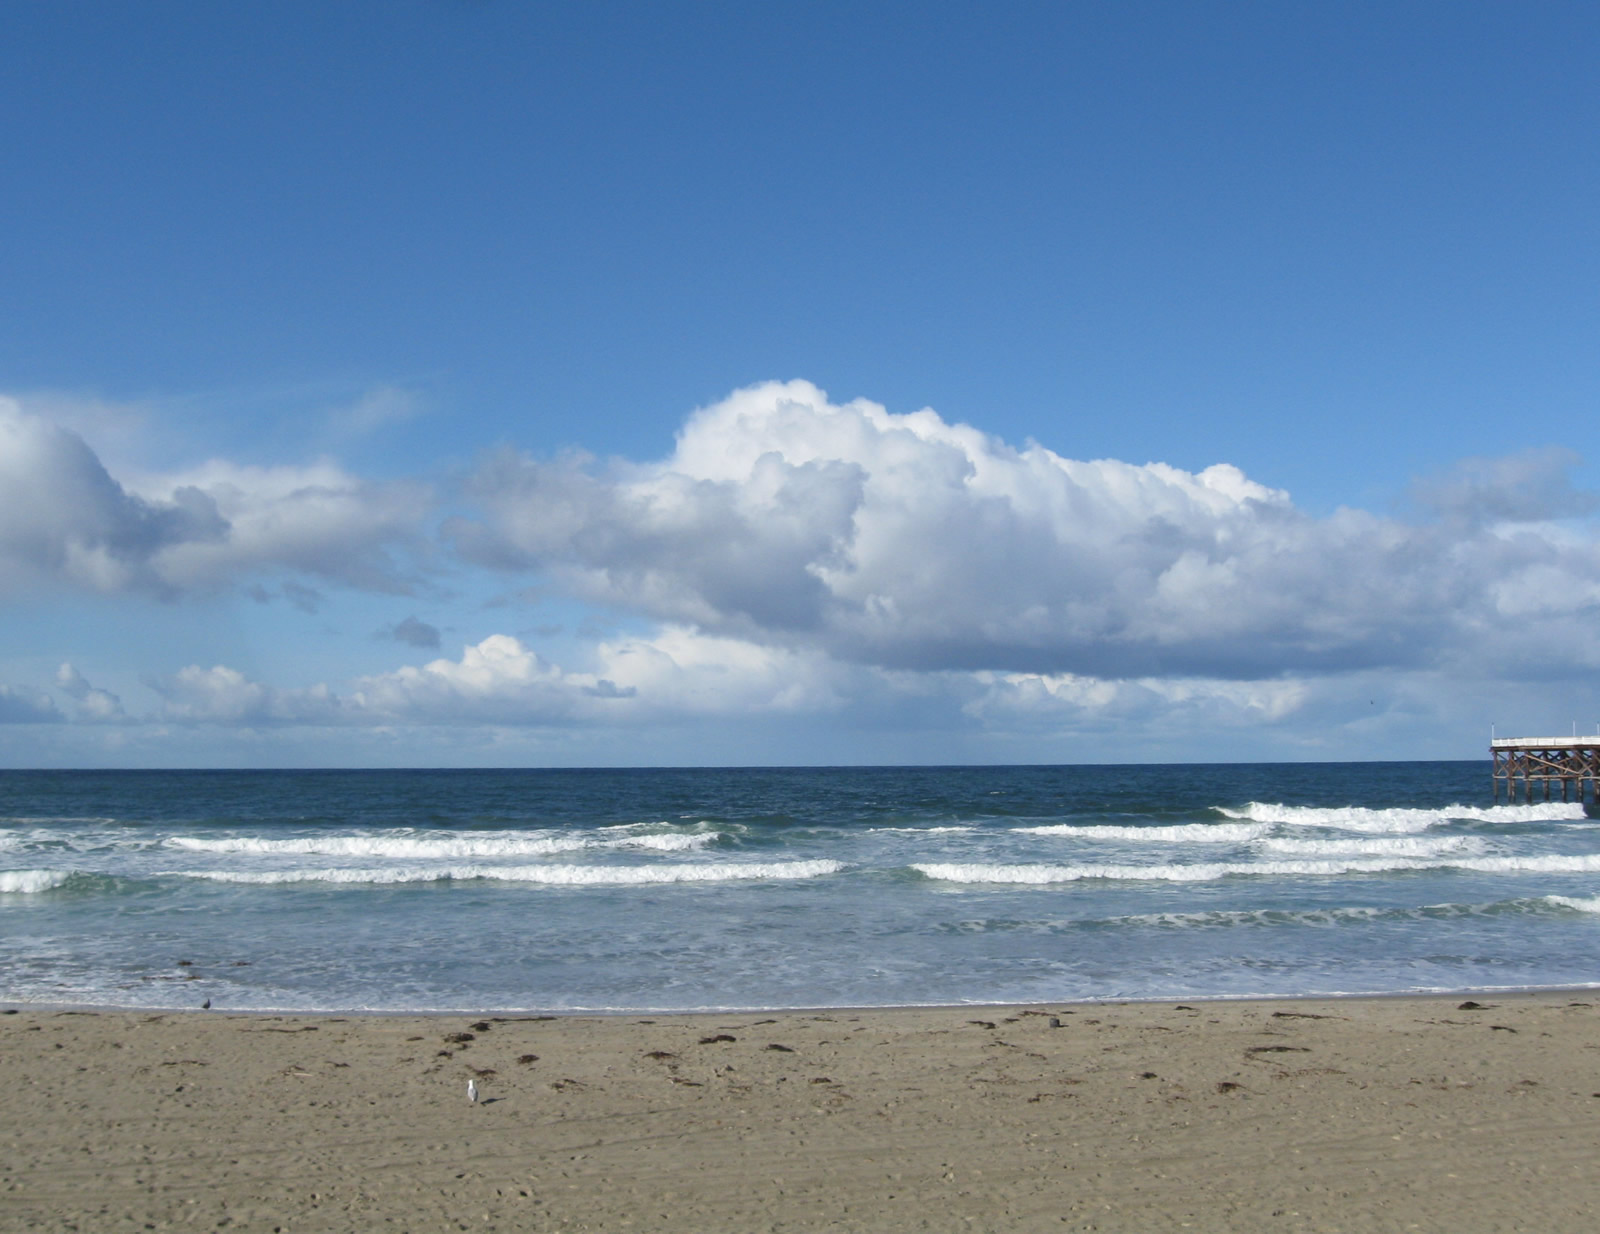 Pacific beach san diego dating